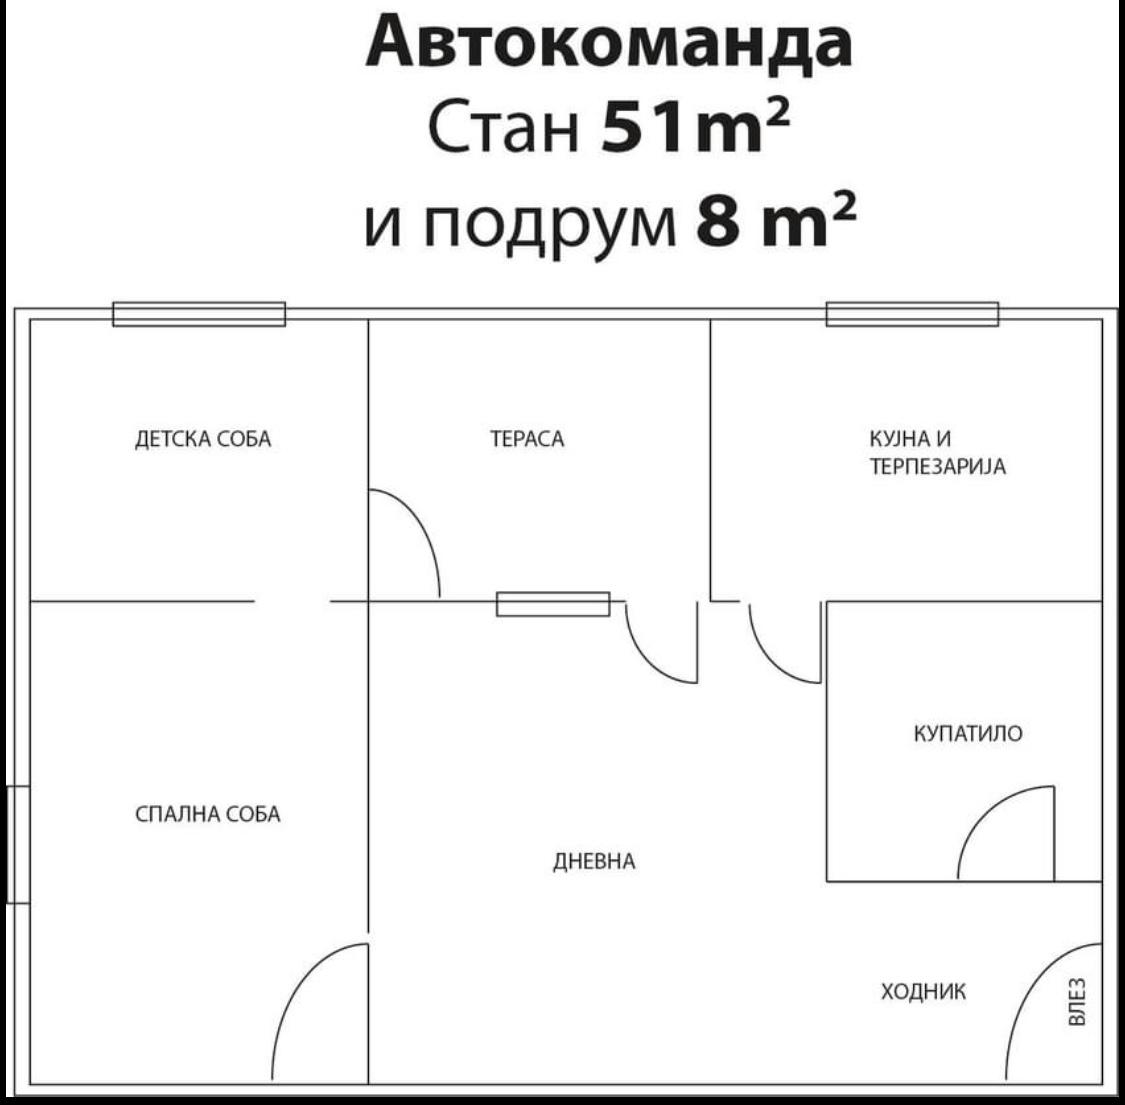 Продавам стан 51м2 во Автокоманда